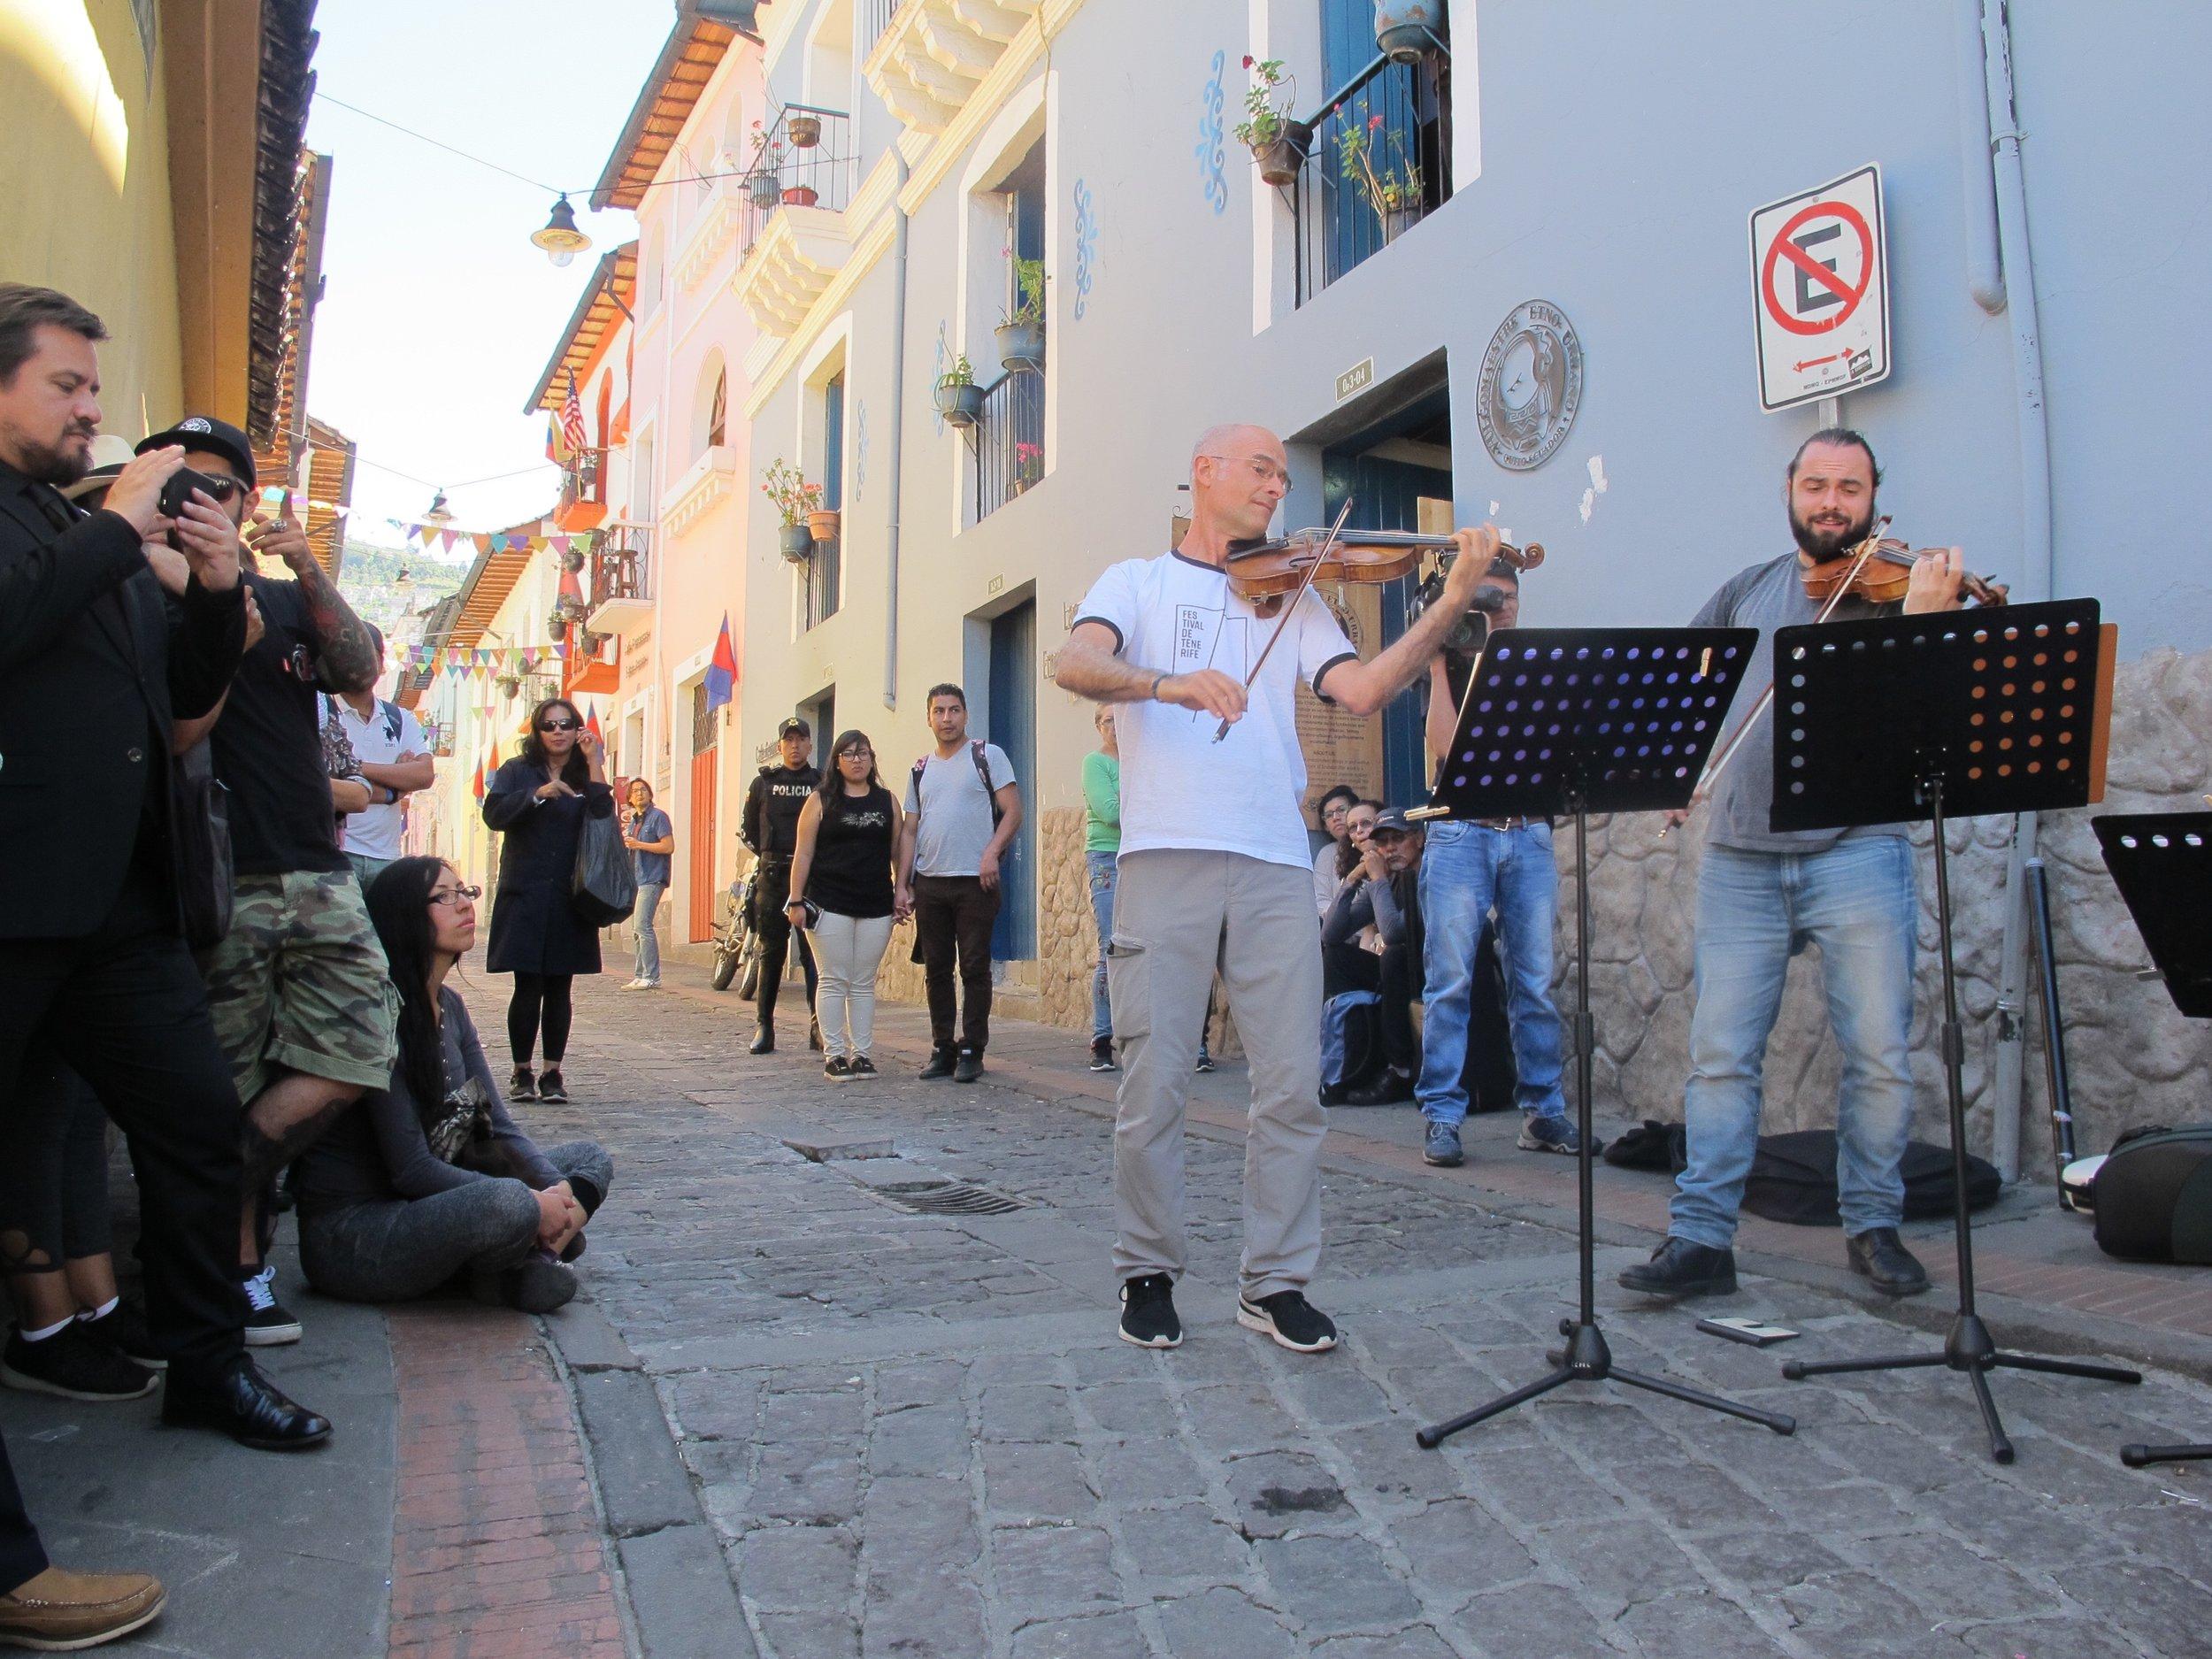 La Ronda. Concierto InSitu Centro histórico de Quito. Junio 2018.